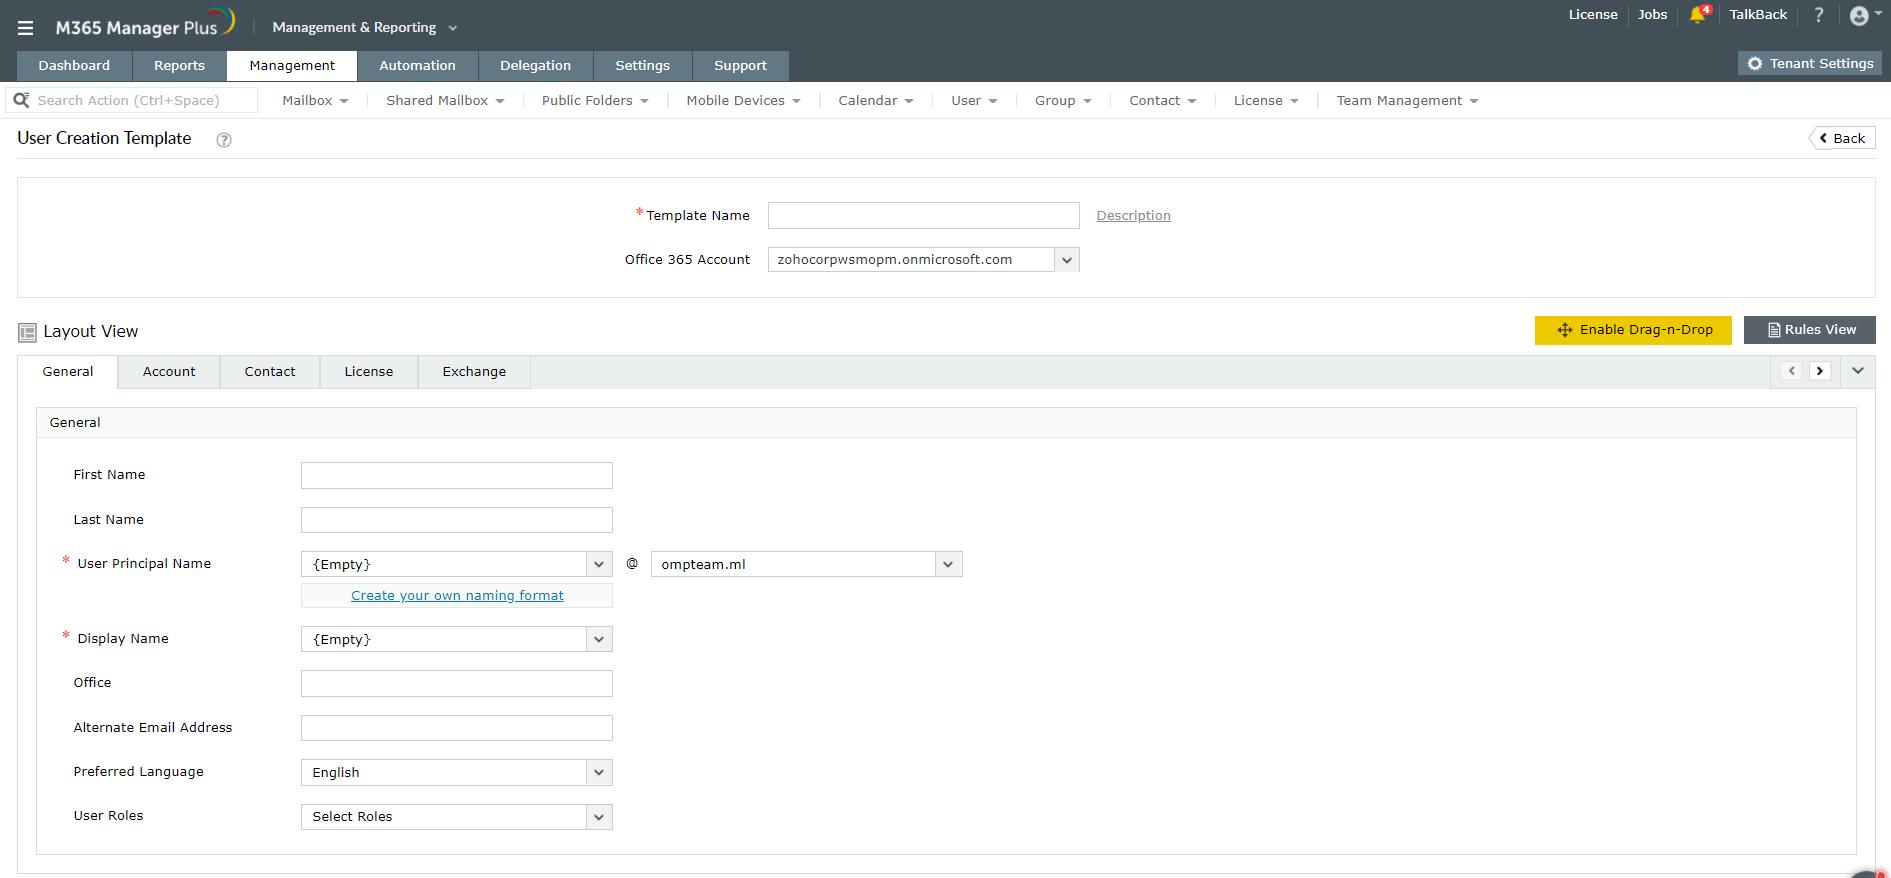 Customize microsoft-365 User Creation Template